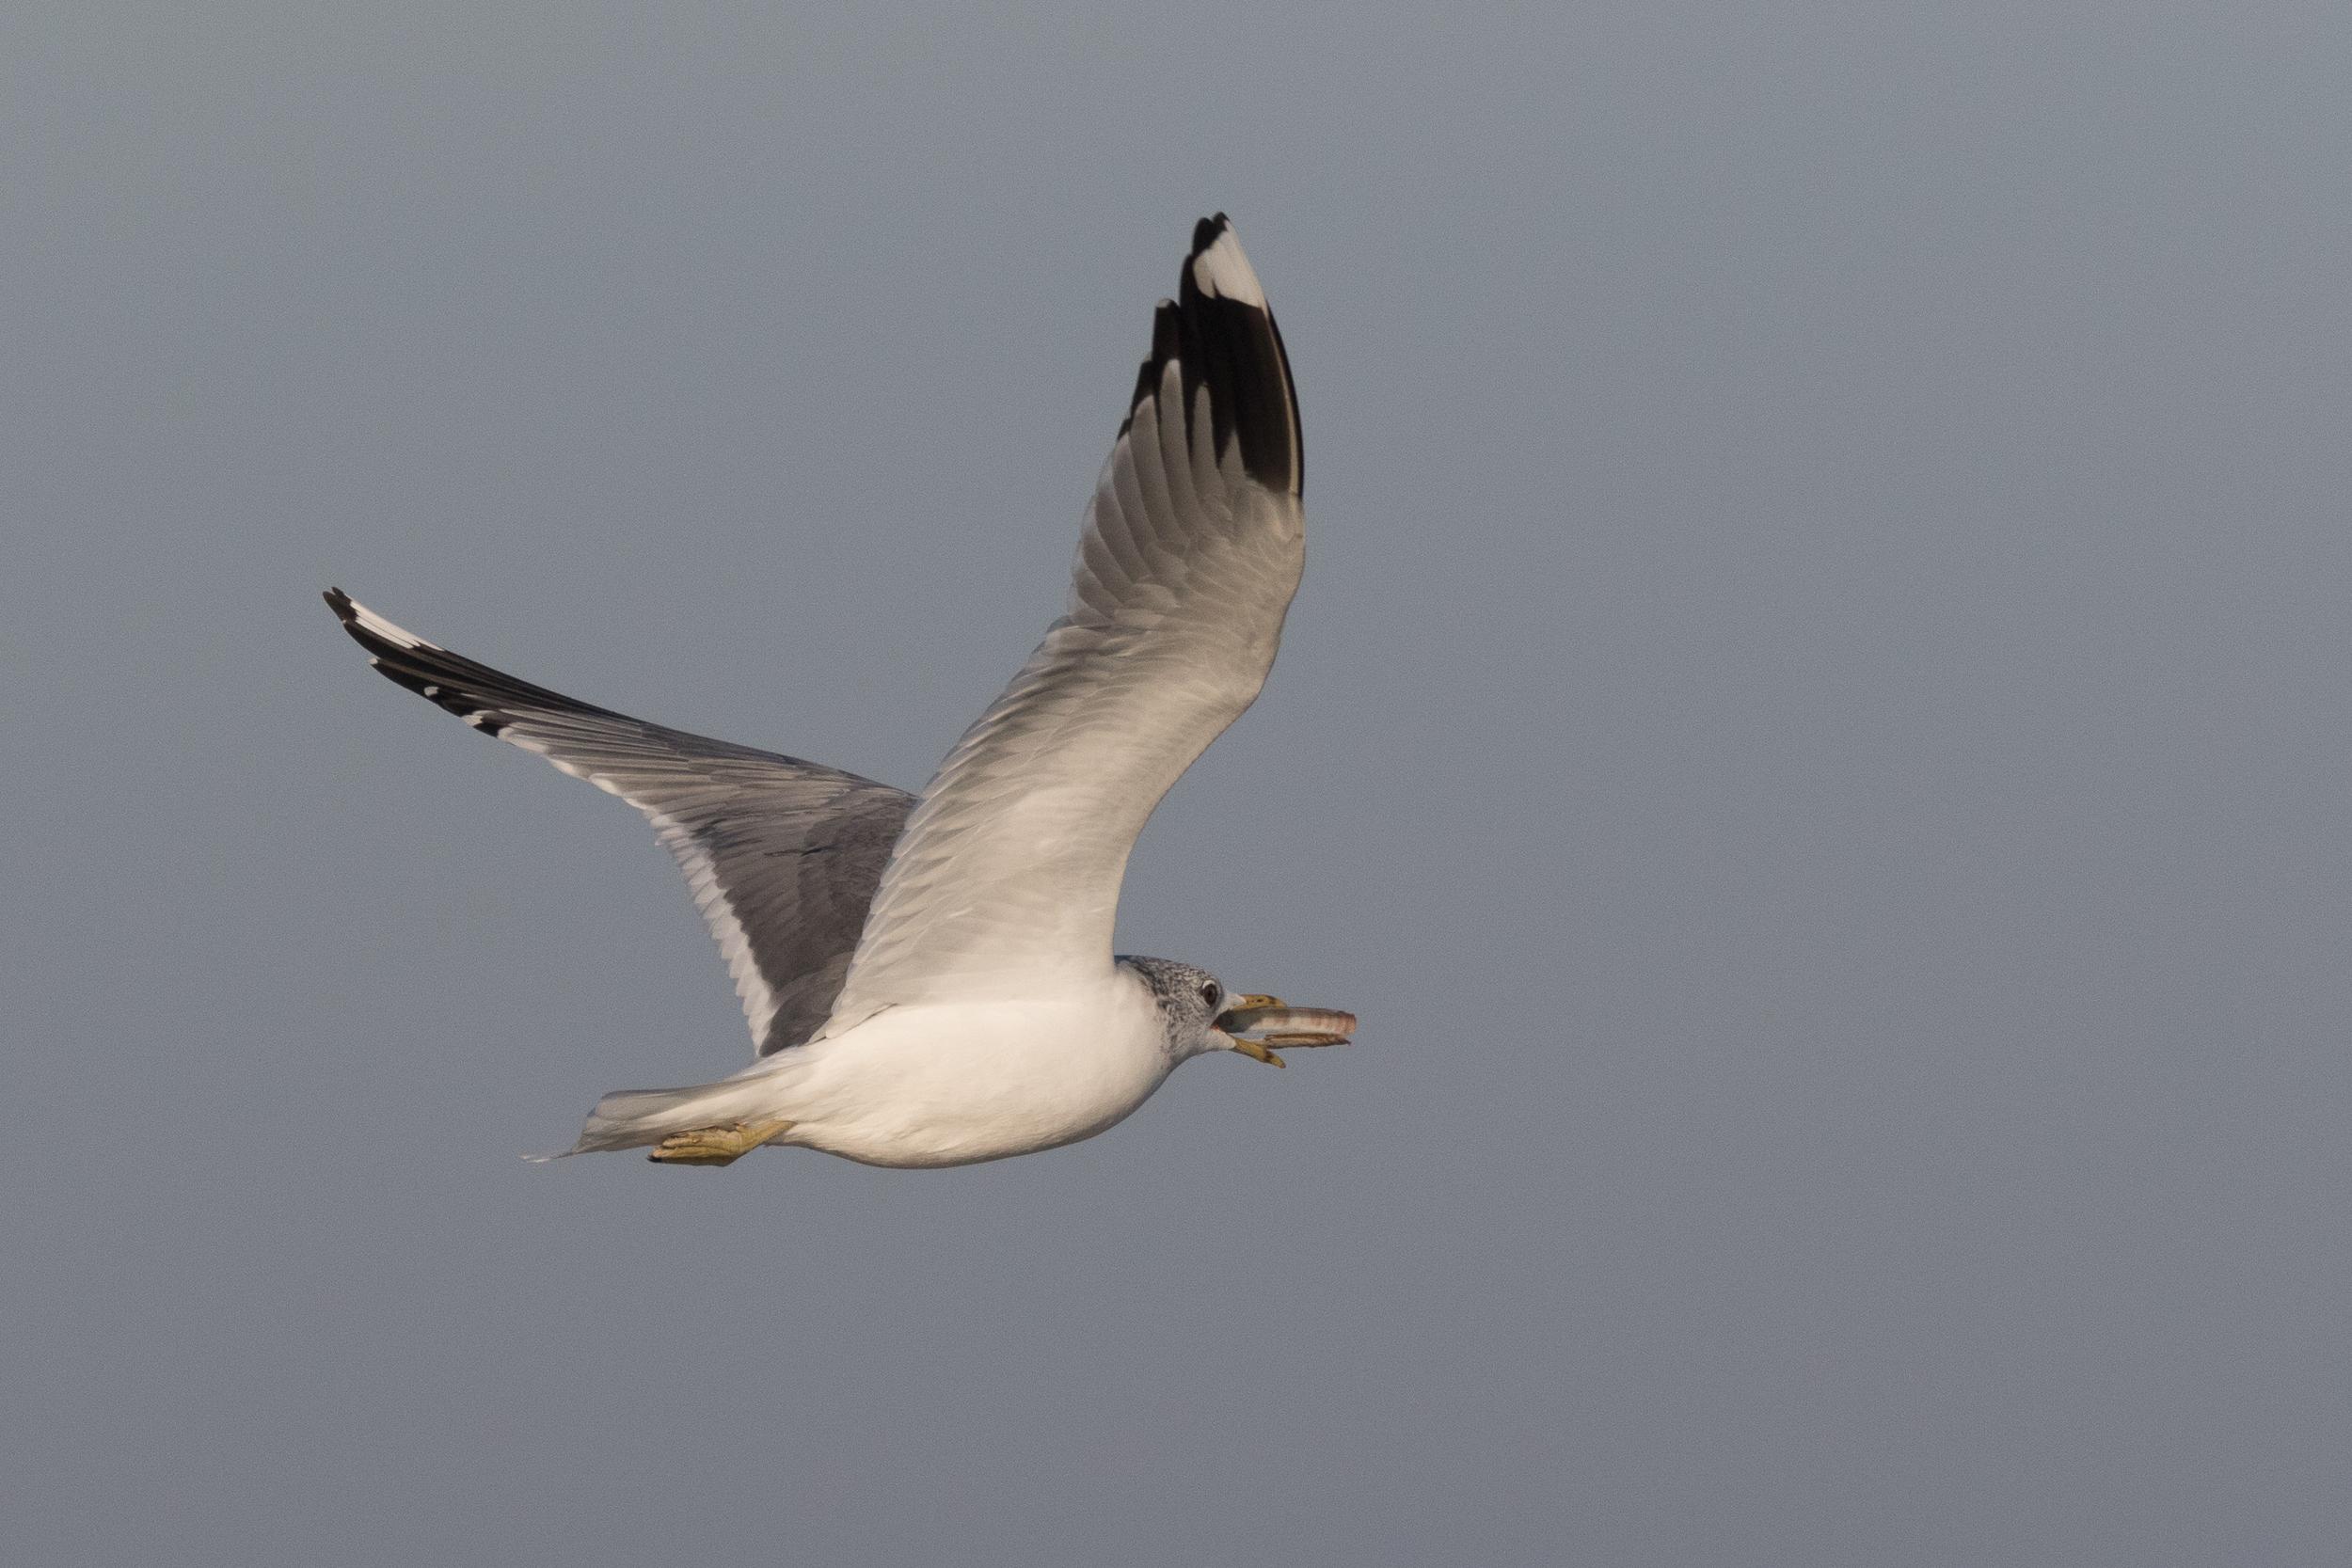 20170121-Common Gull Adult-14.jpg